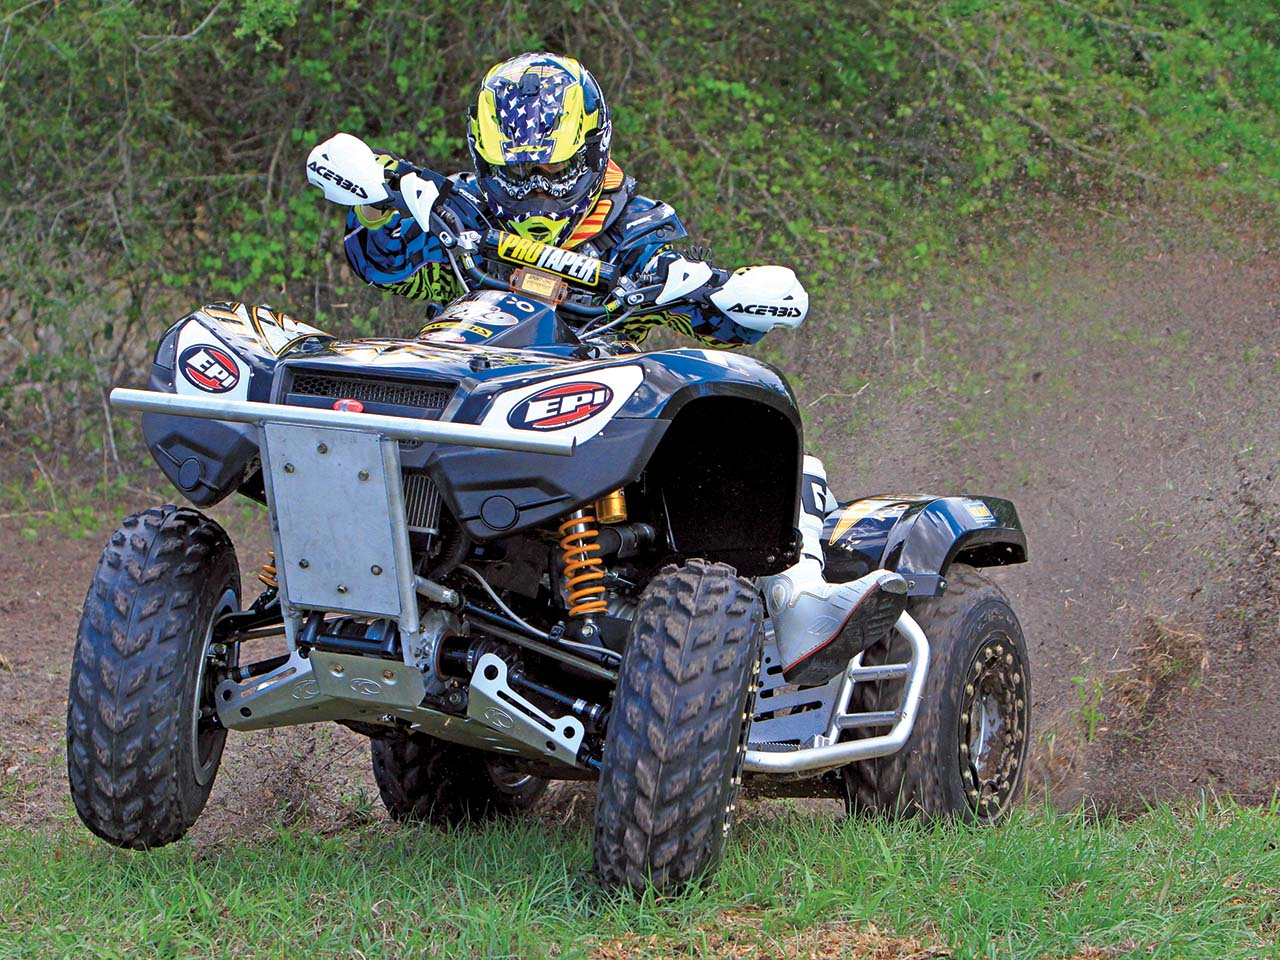 2012.kymco_.mxu450i.taylor-stoddard.front_.racing.on-grass.jpg